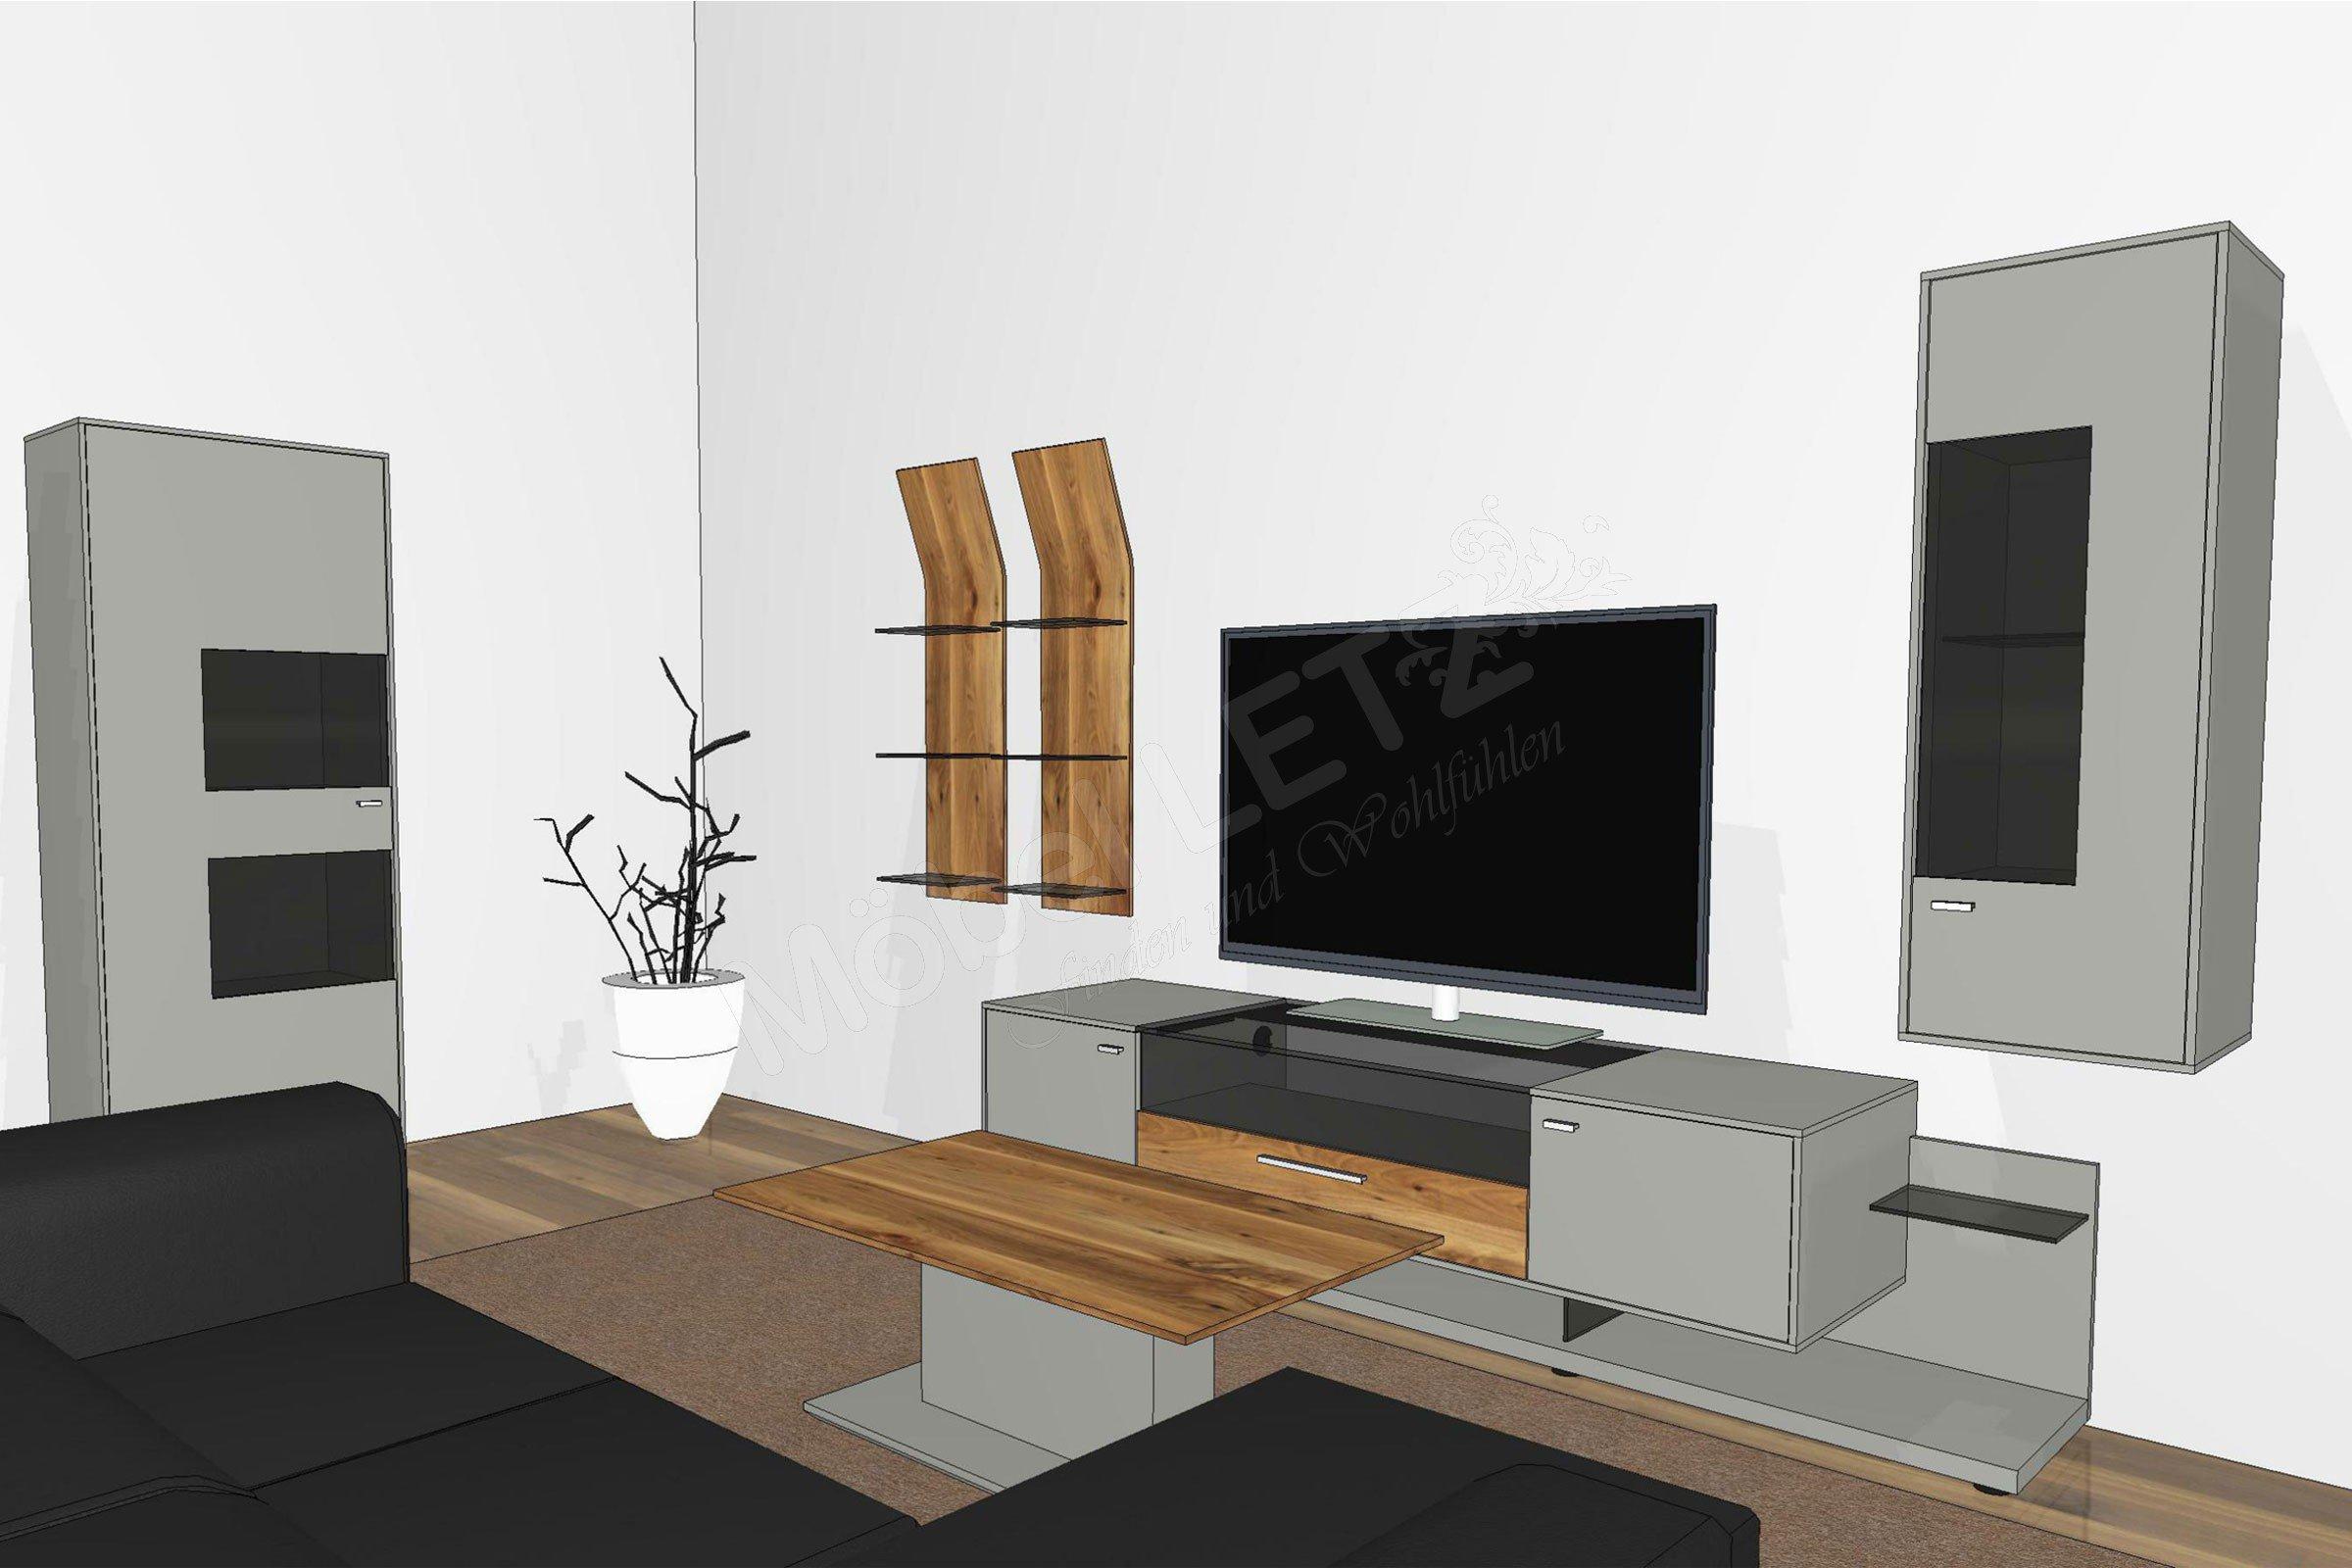 Gwinner wohnwand media concept mc902 fango astnussbaum - Wohnwand gwinner ...